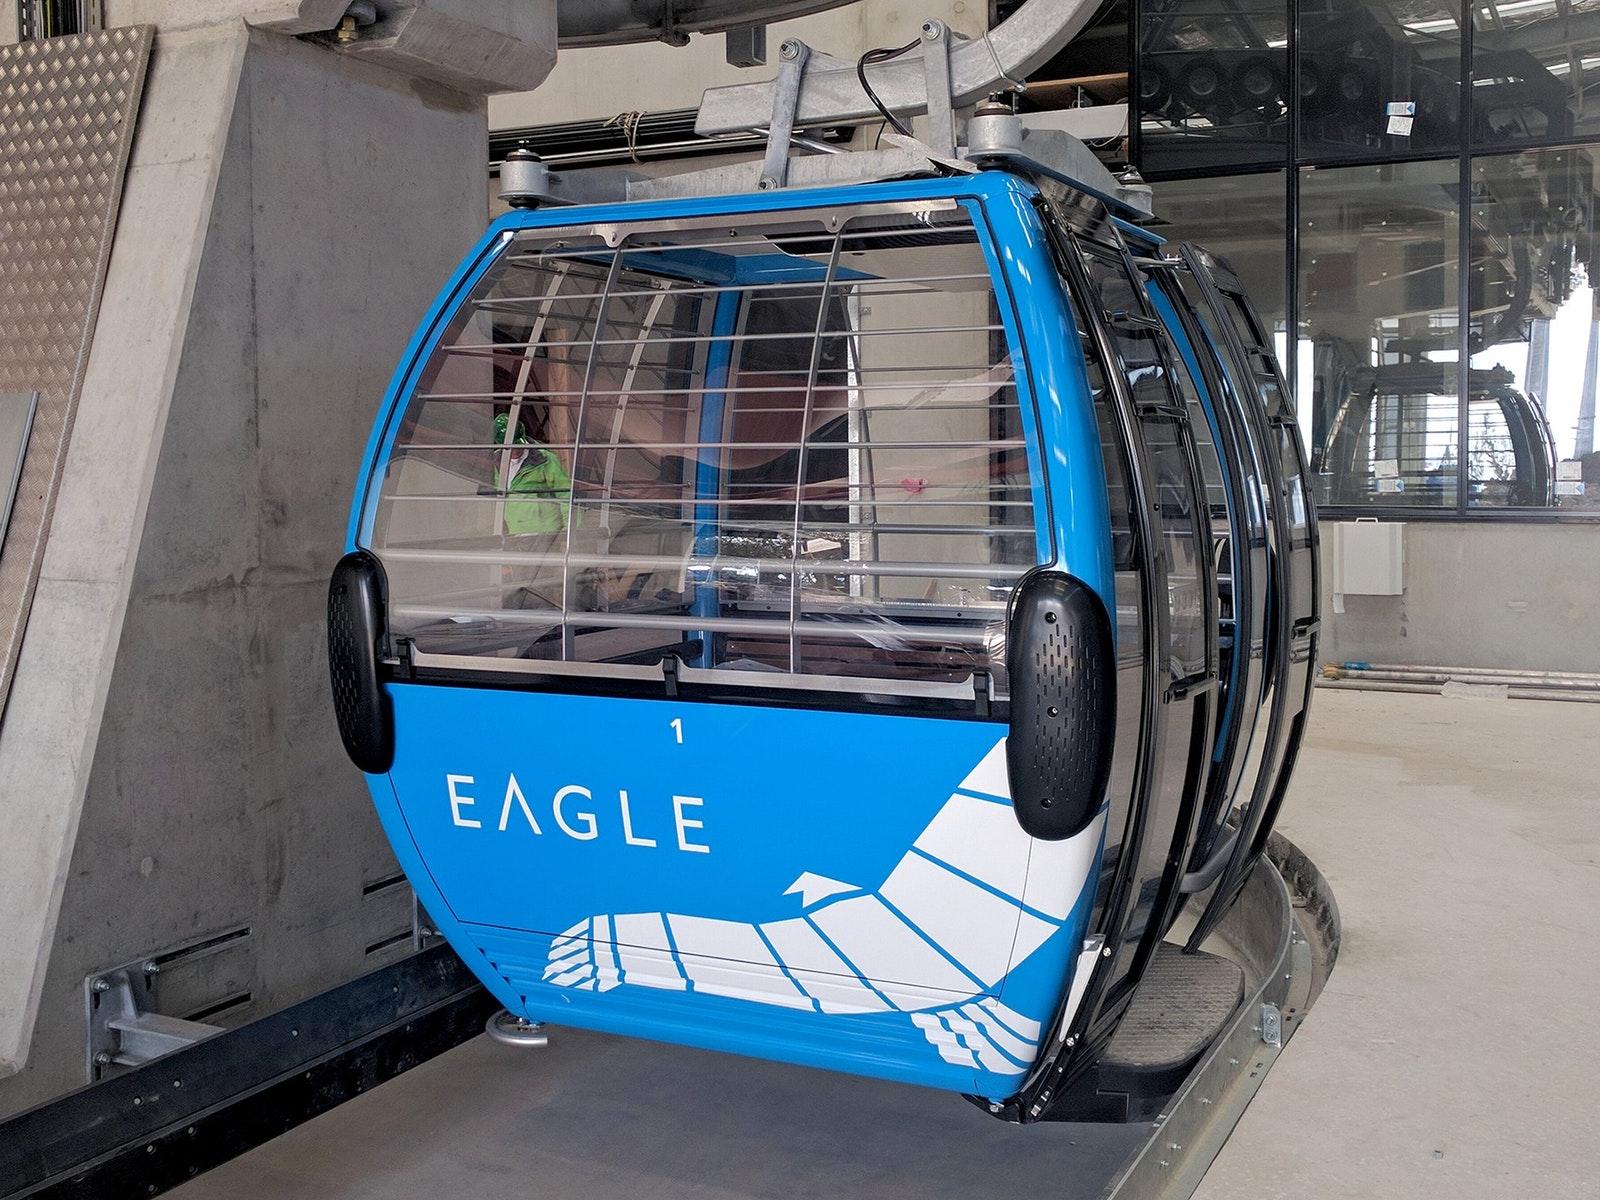 Arthurs Seat Eagle Gondola